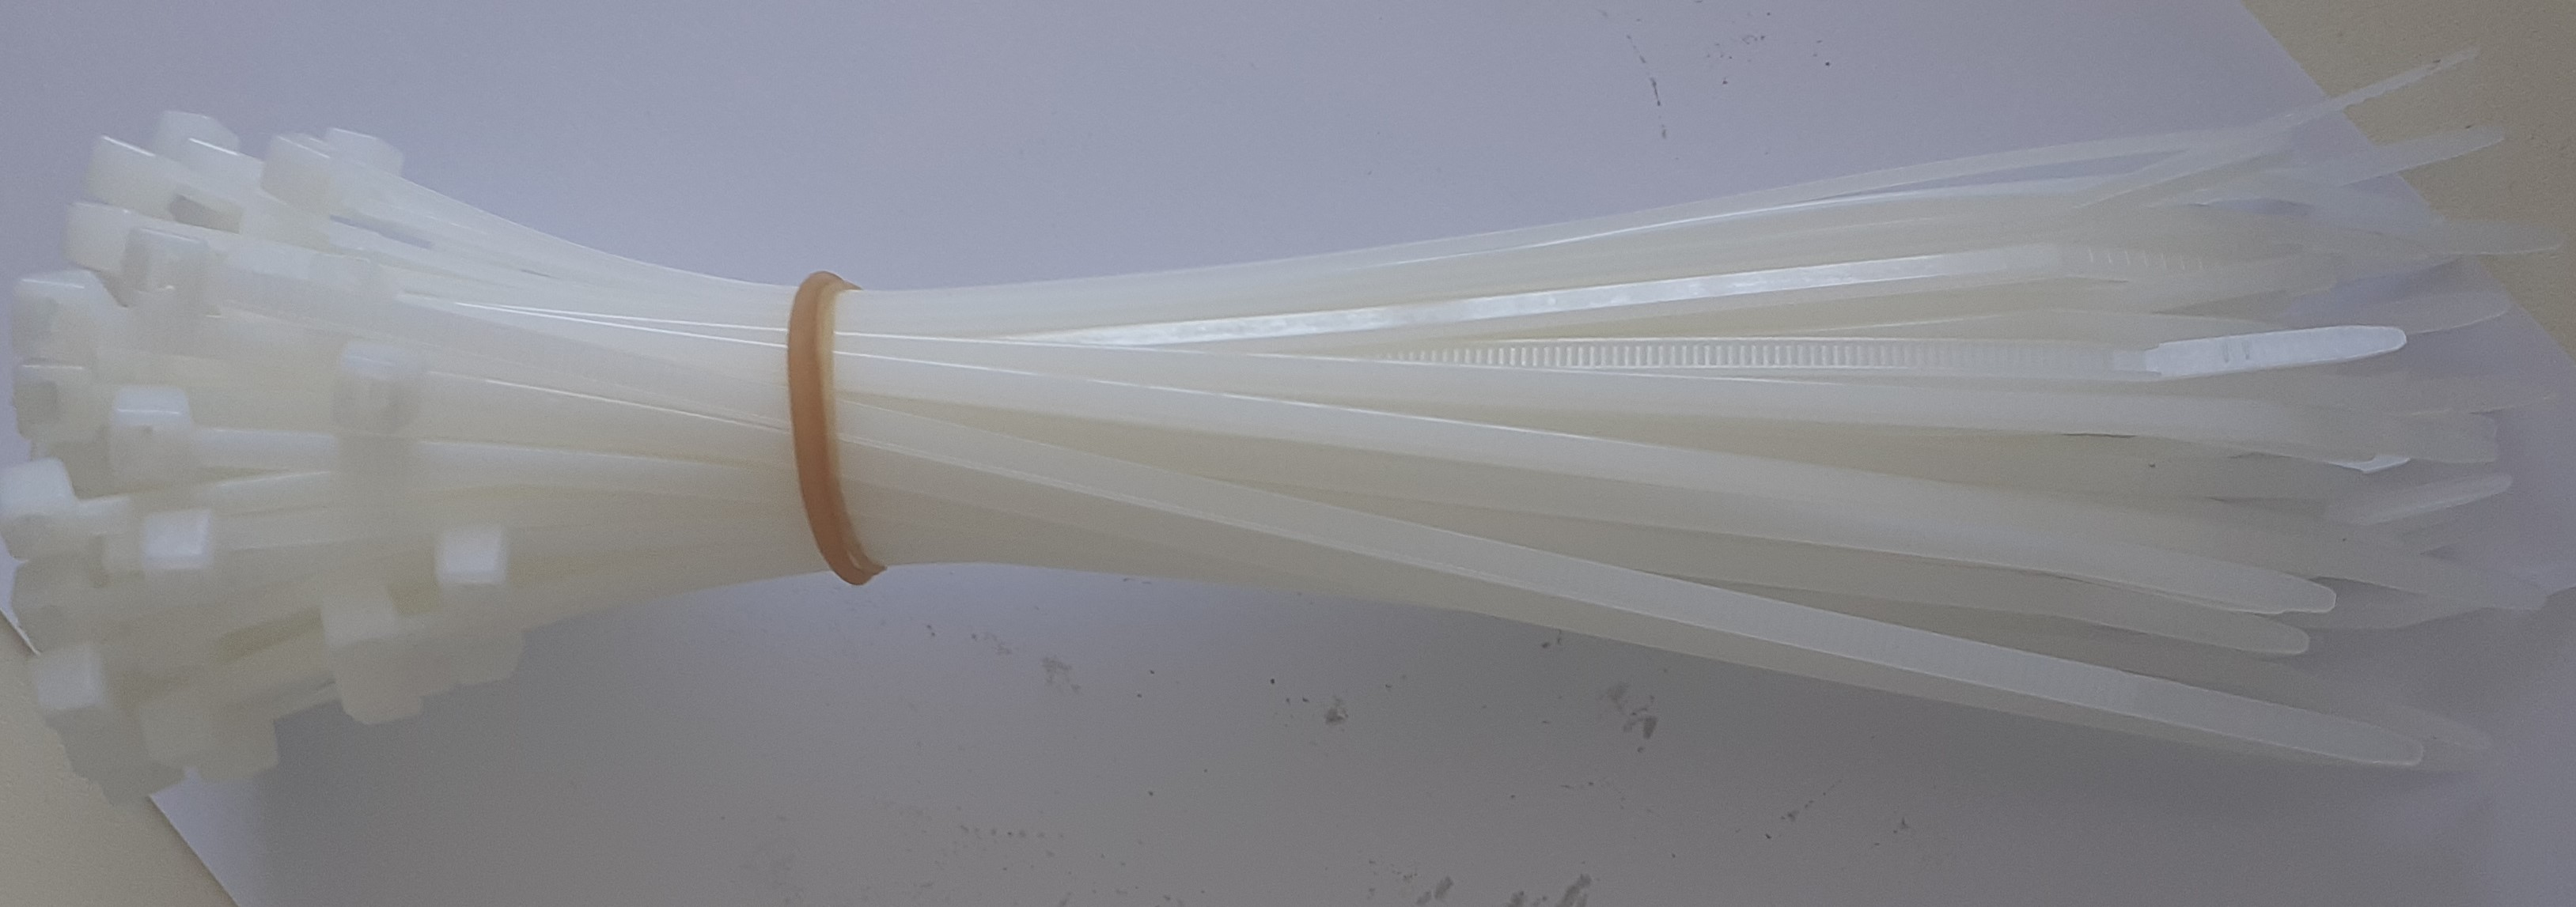 COLIER PLASTIC 1,3*3,5*300MM,50BUC,GRANIT